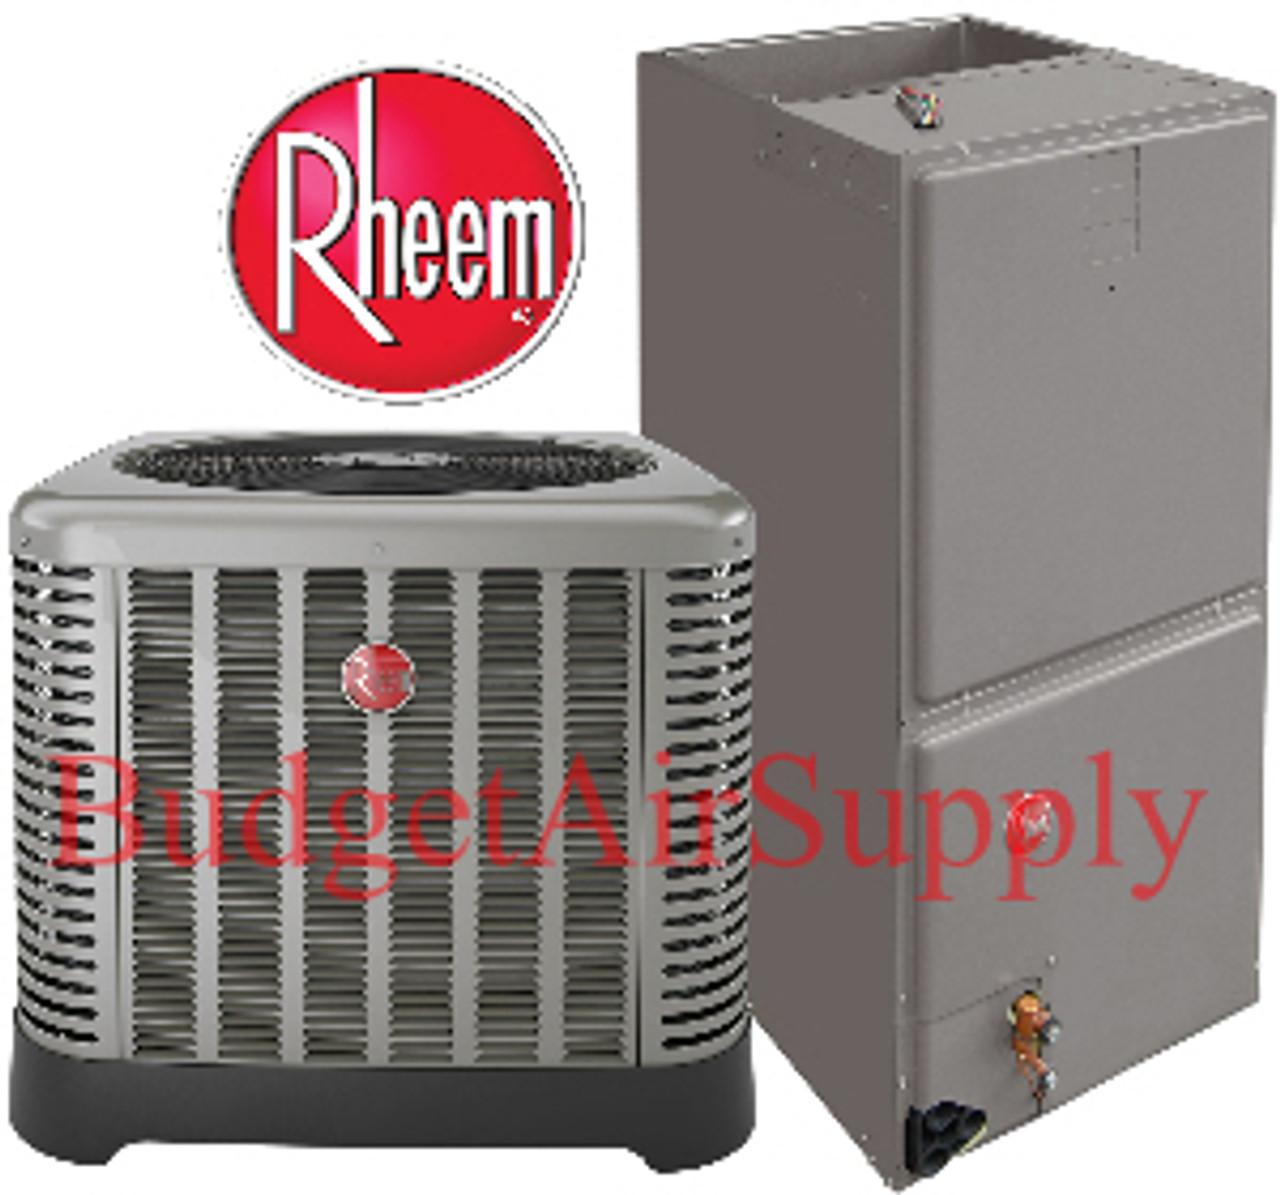 Rheem   Ruud  U0026quot Classic U0026quot  3 Ton 15 Seer Heat Pump Split System